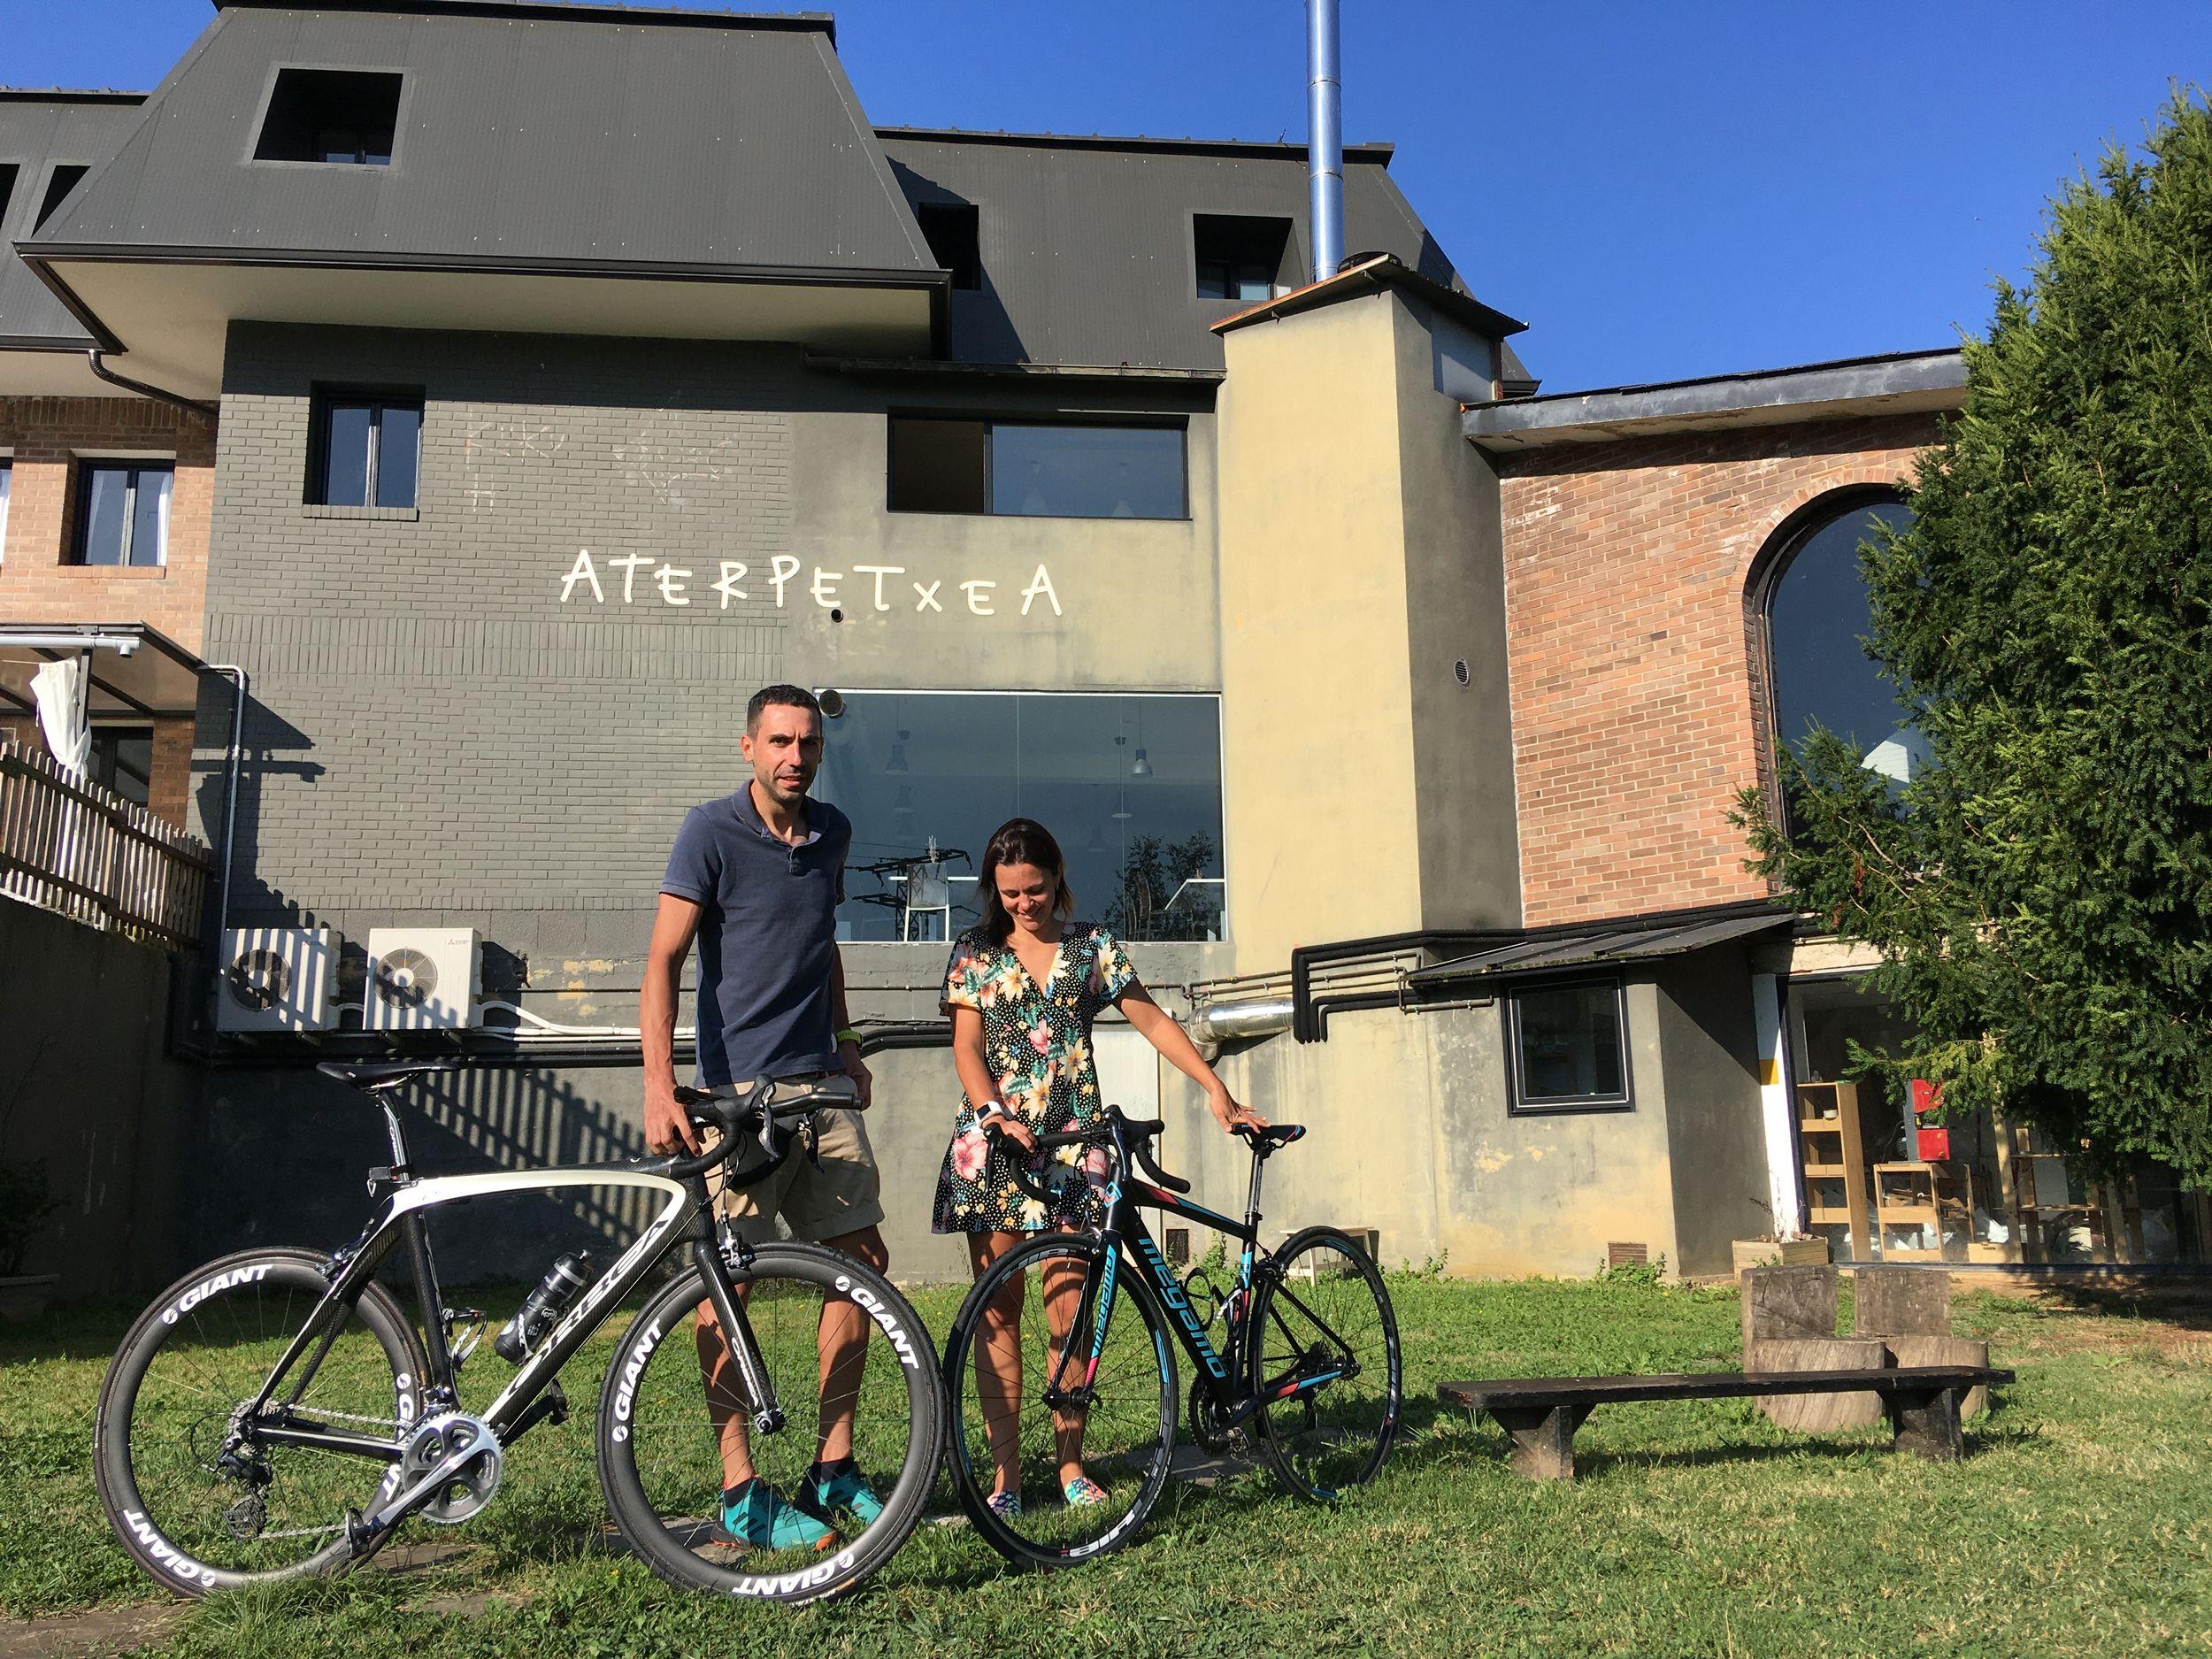 cicloturismo-bikefriendly-abaraxka-pais-vasco